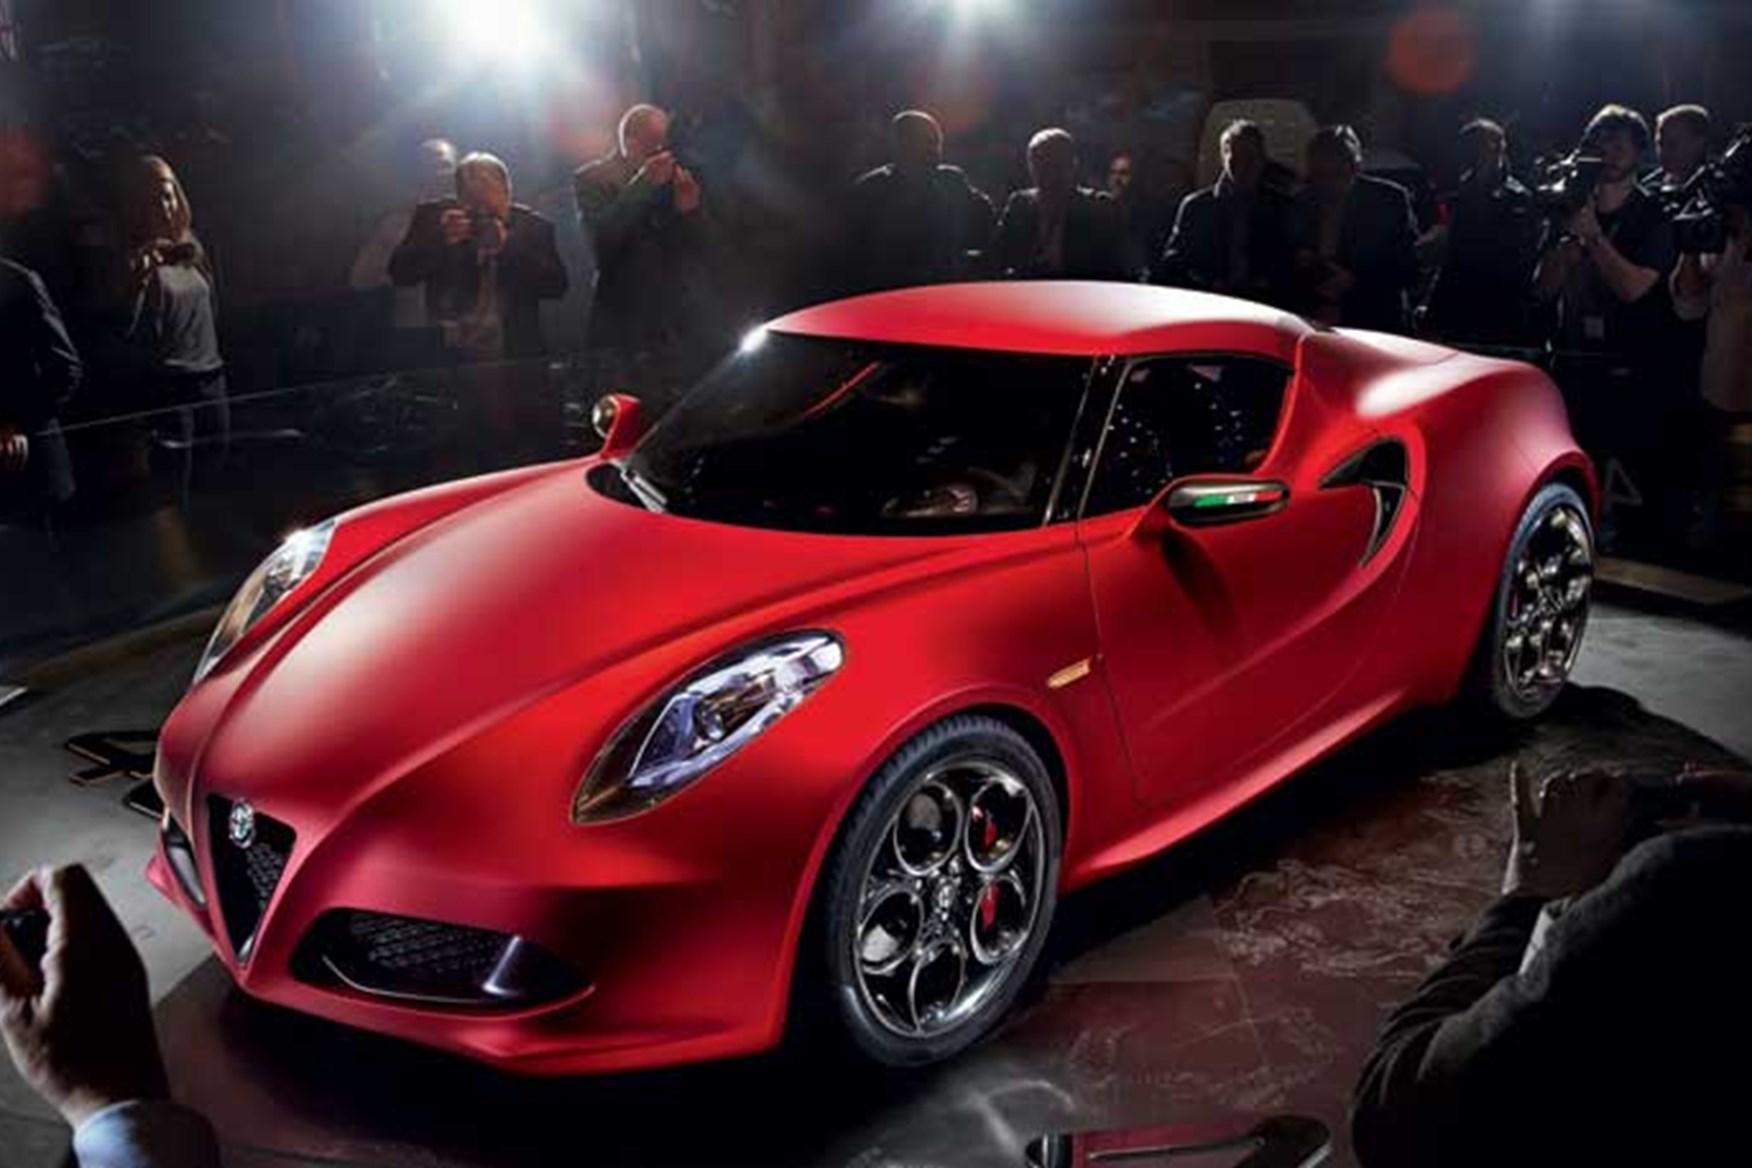 86 Alfa Romeo Wiring Diagrams | Wiring Liry  Dodge Dakota Wiring Diagram Alfa Romeo on